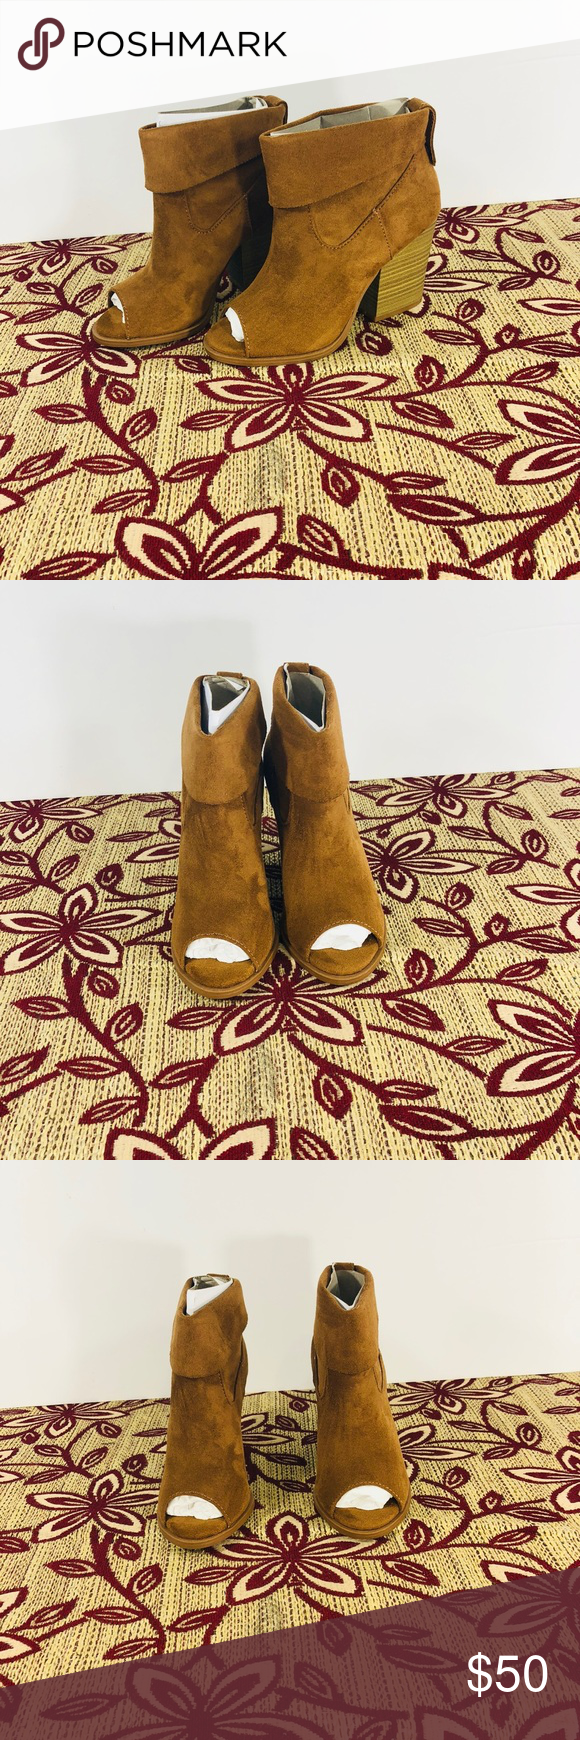 "ef0bedc3b03 Pop Shawnee women shootie size 5M ▫ brand   pop ▫ size   5M ▫ color    cognac ▫ shoe heel height   3 1 2"" ▫ width medium Alternate closure ..."